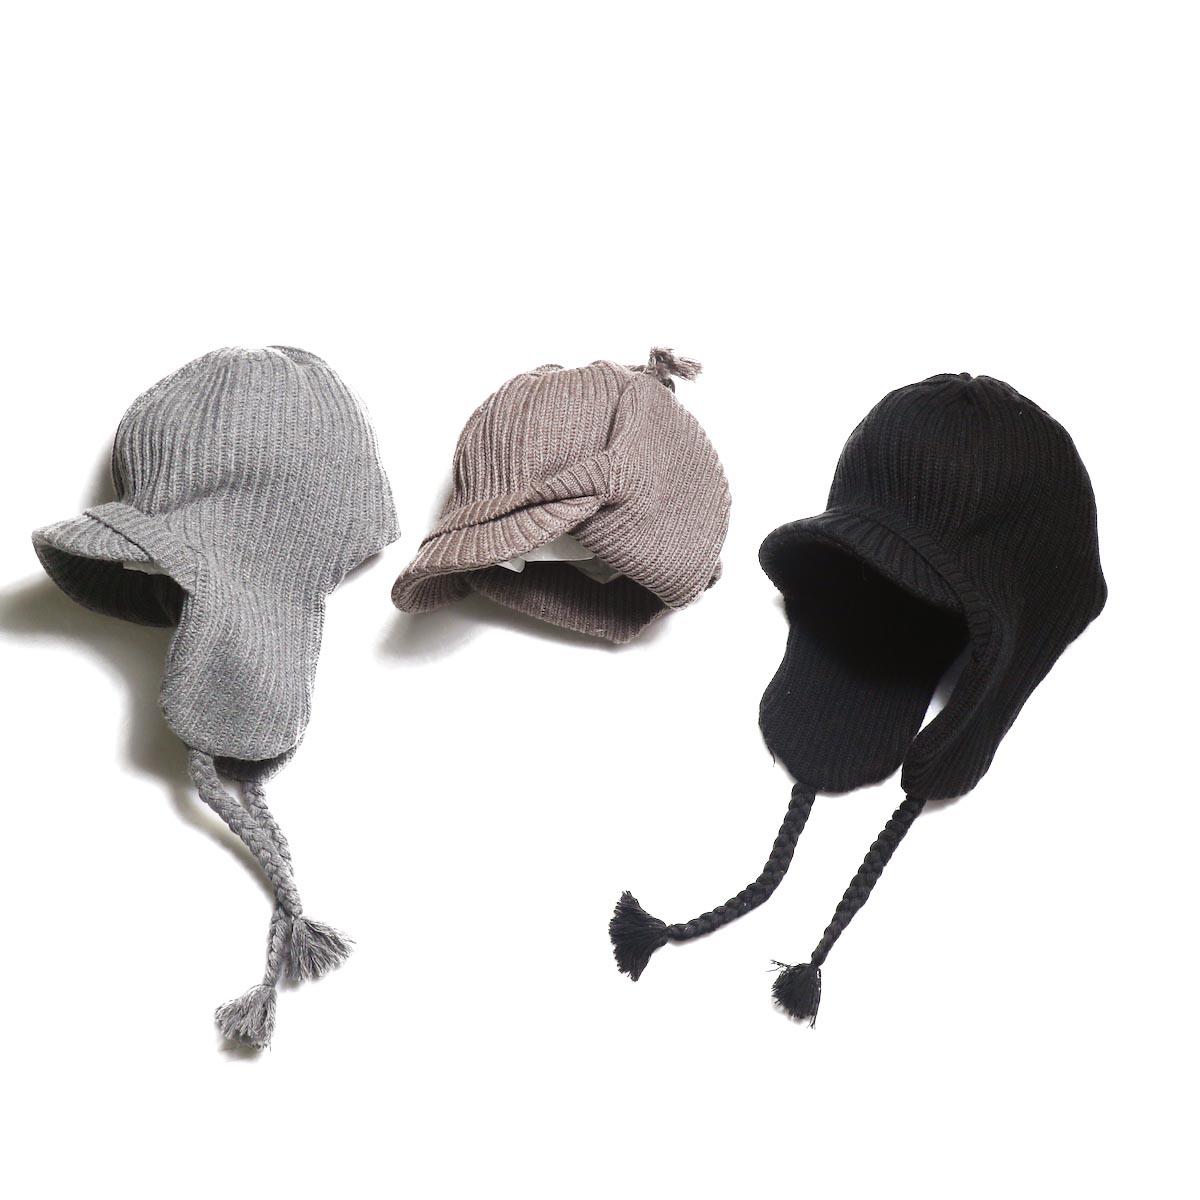 UNUSED Ladie's / UH0513 string knit cap.